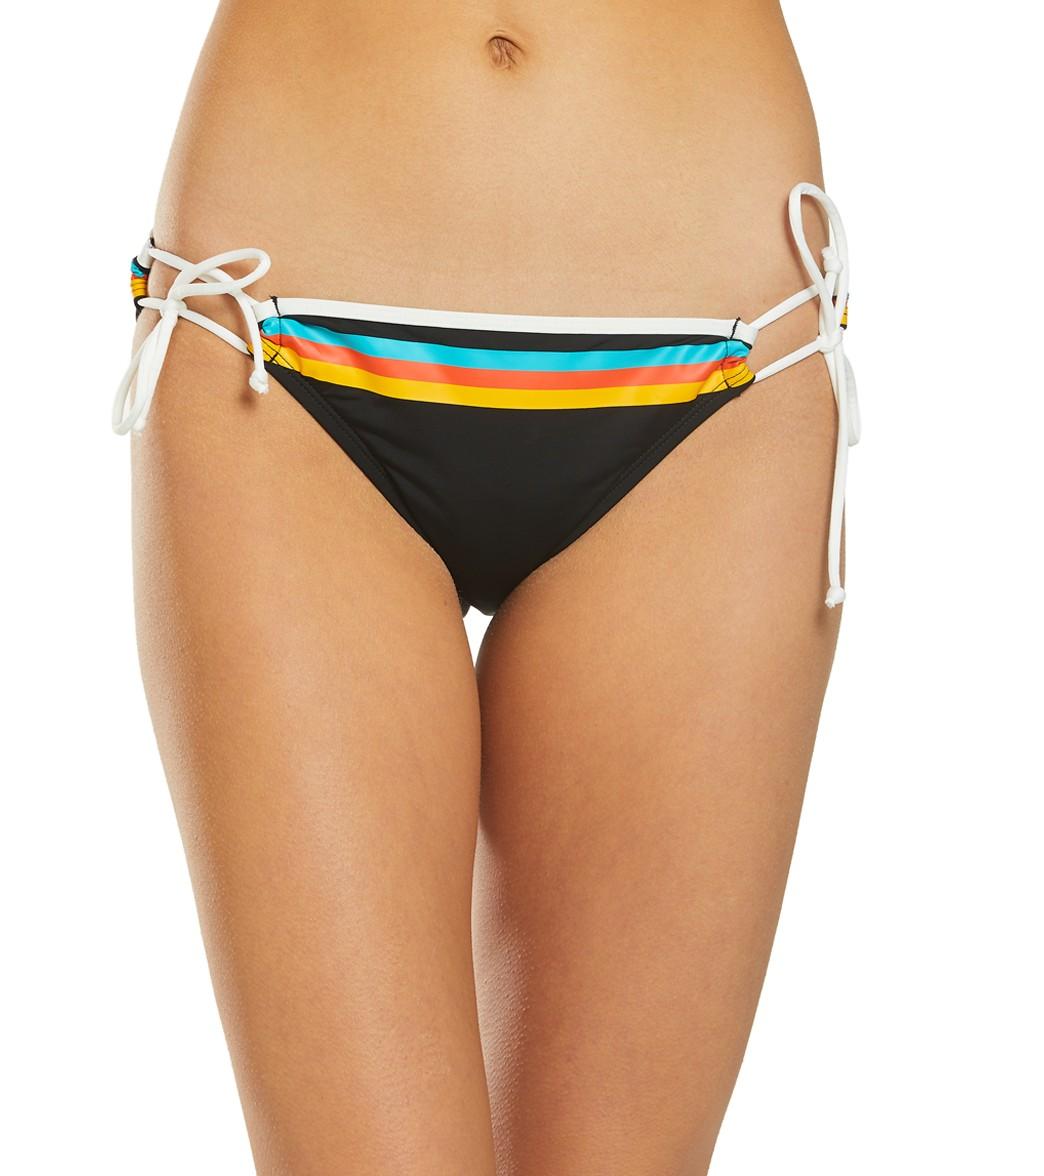 Adjustable Heritage Stripe Bottom Bikini Hobie vynP8ONw0m